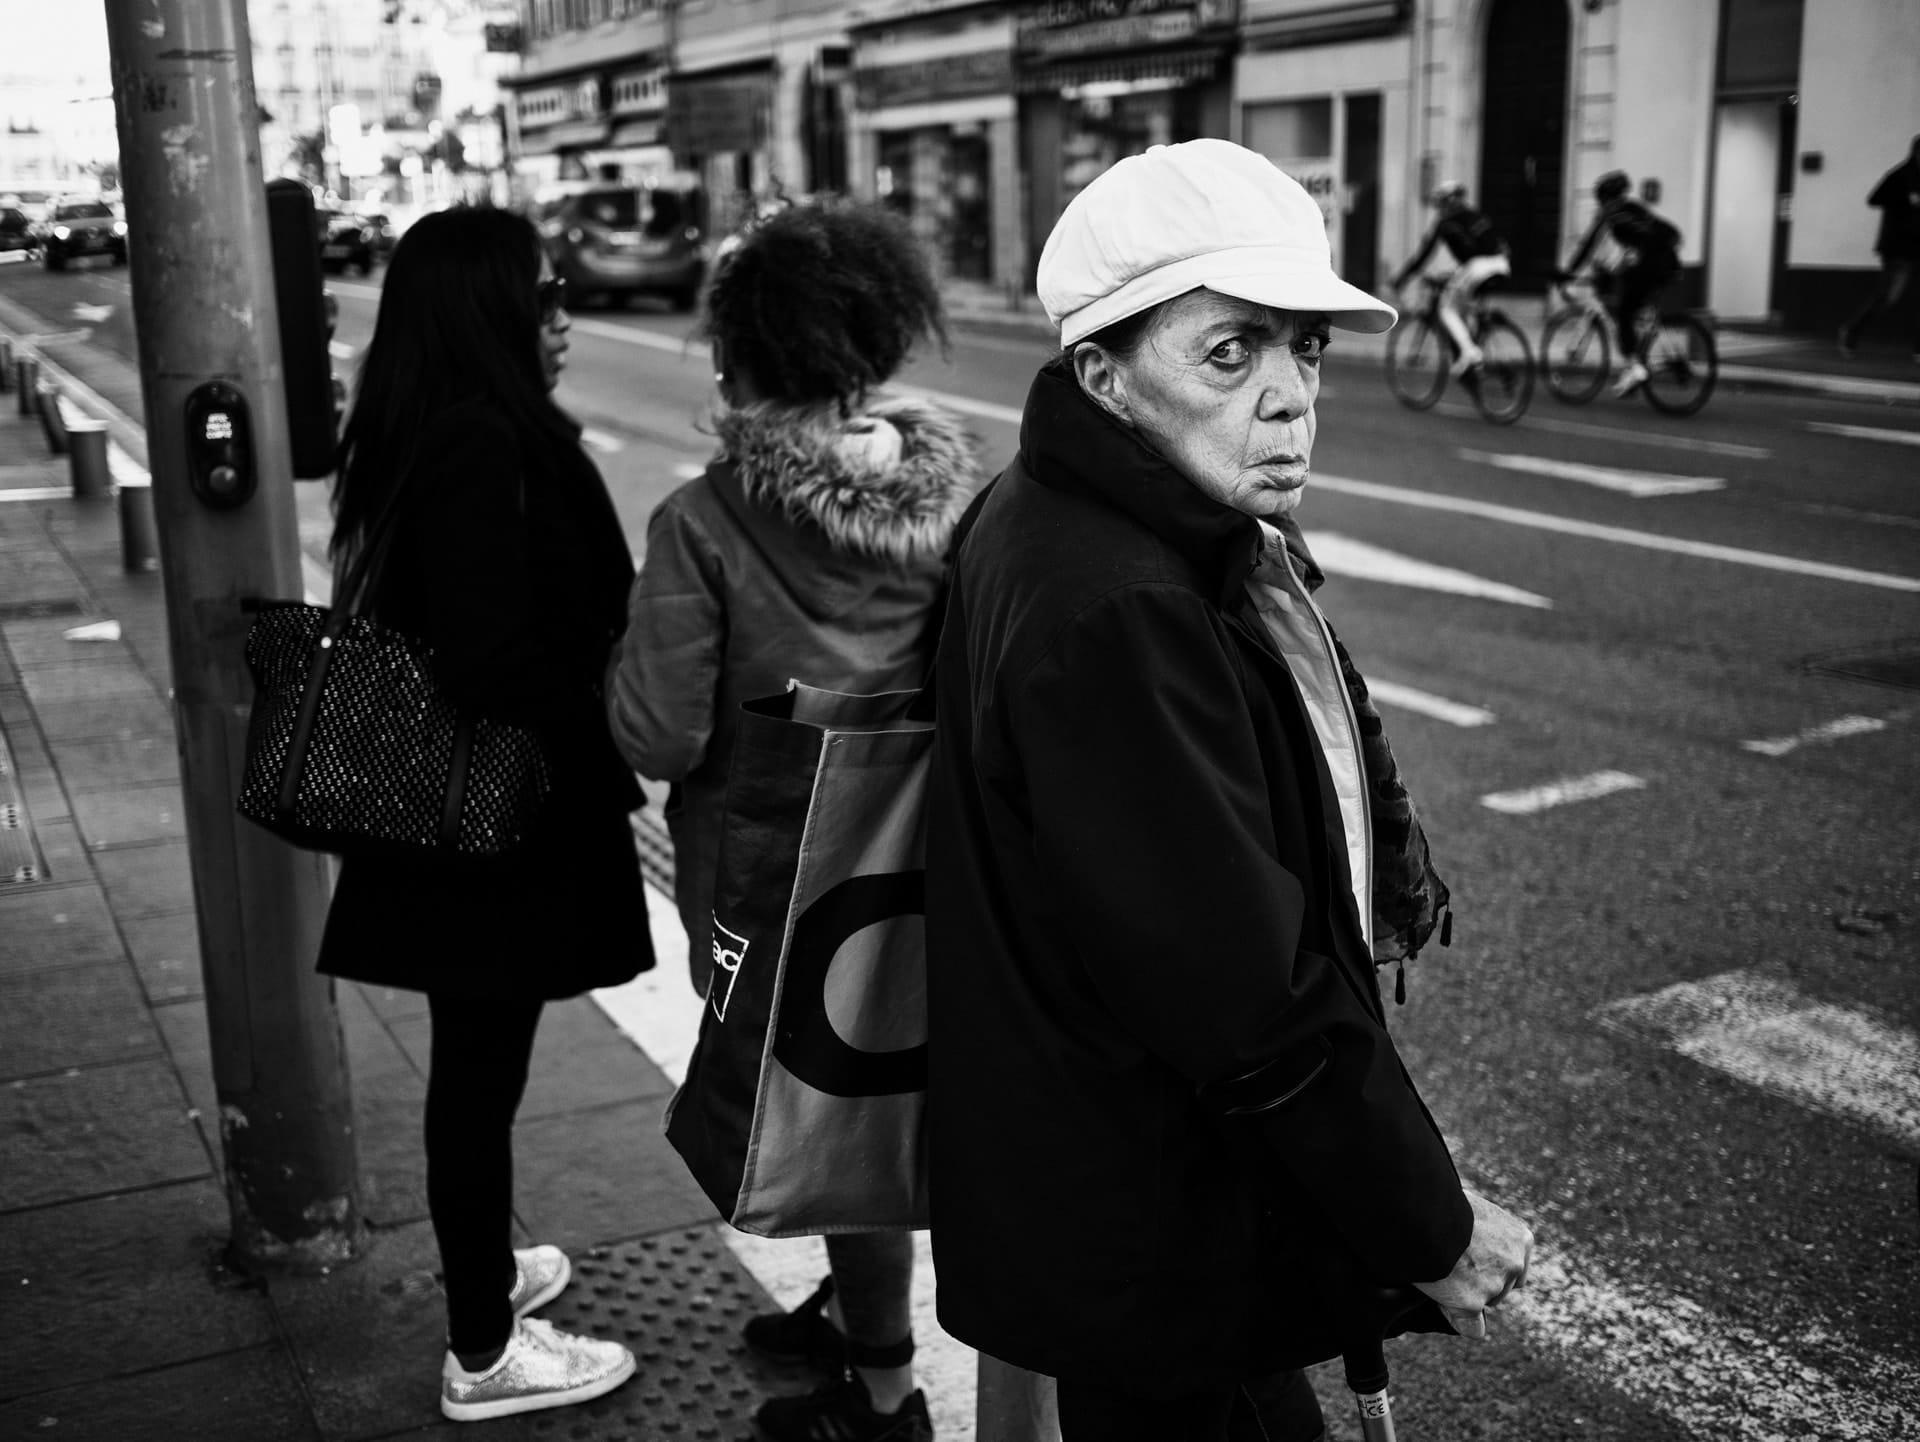 """Hatred"" street photograph by Alain Karsenty"